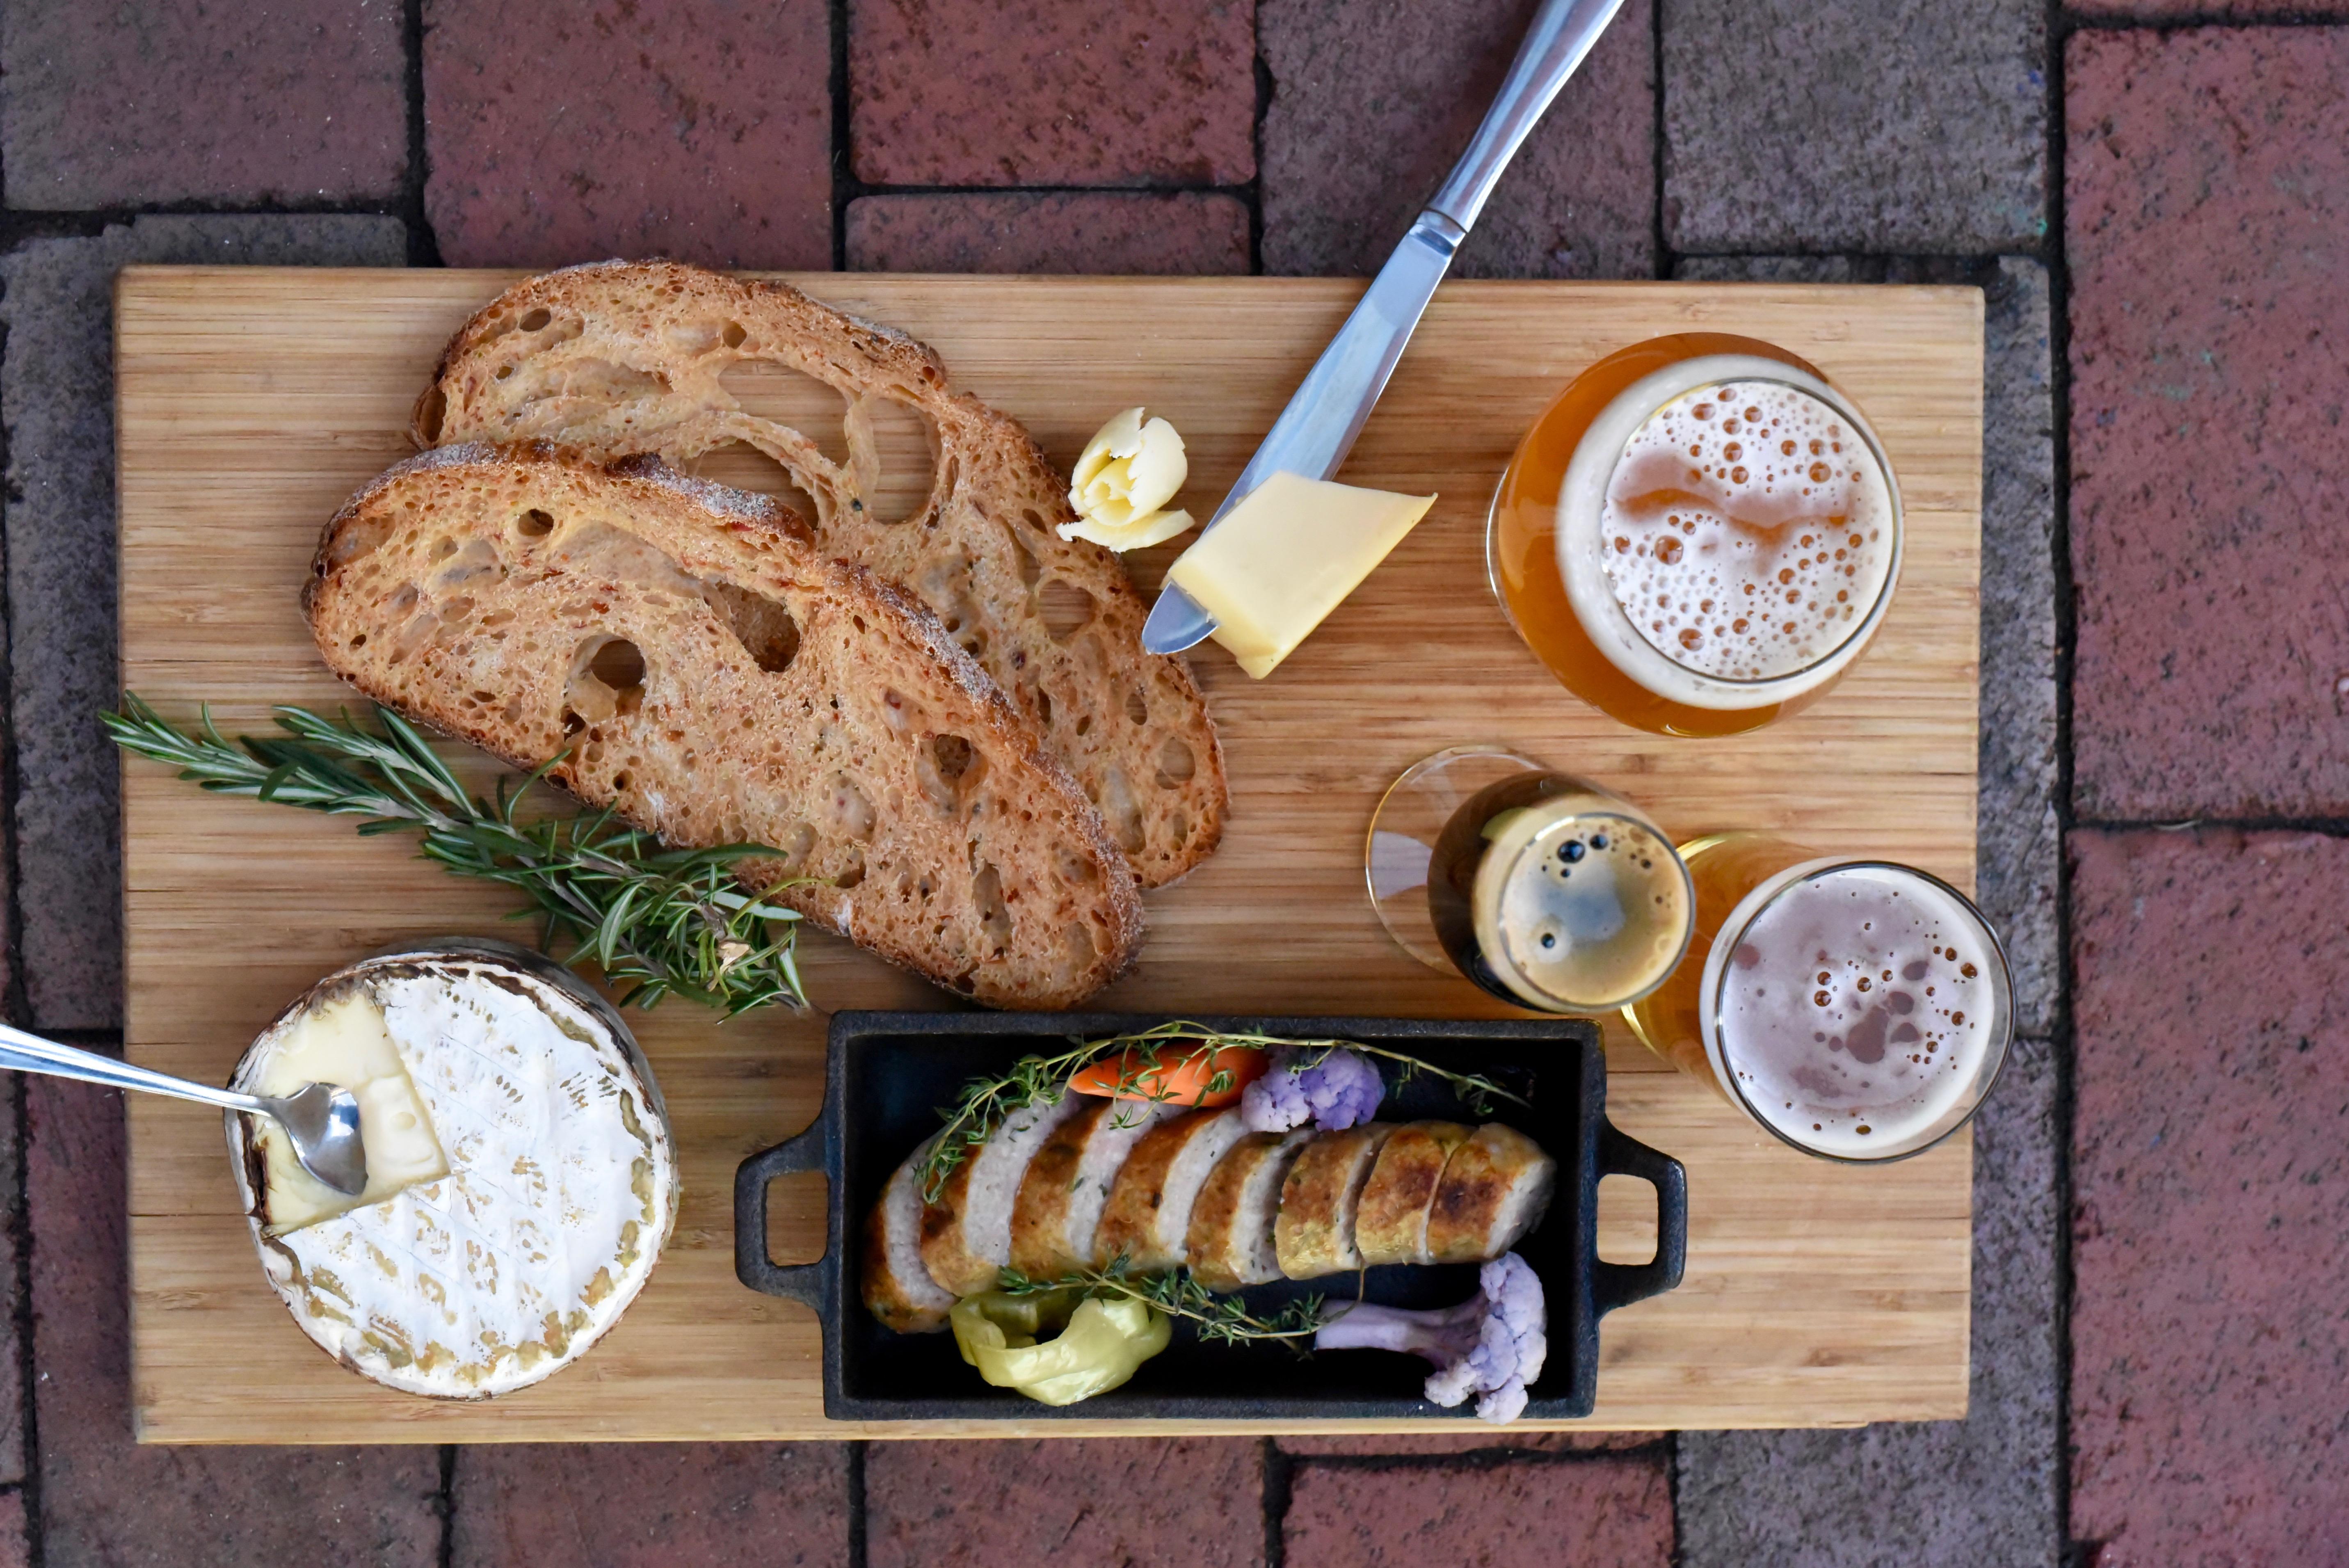 Brato Brewhouse food photo